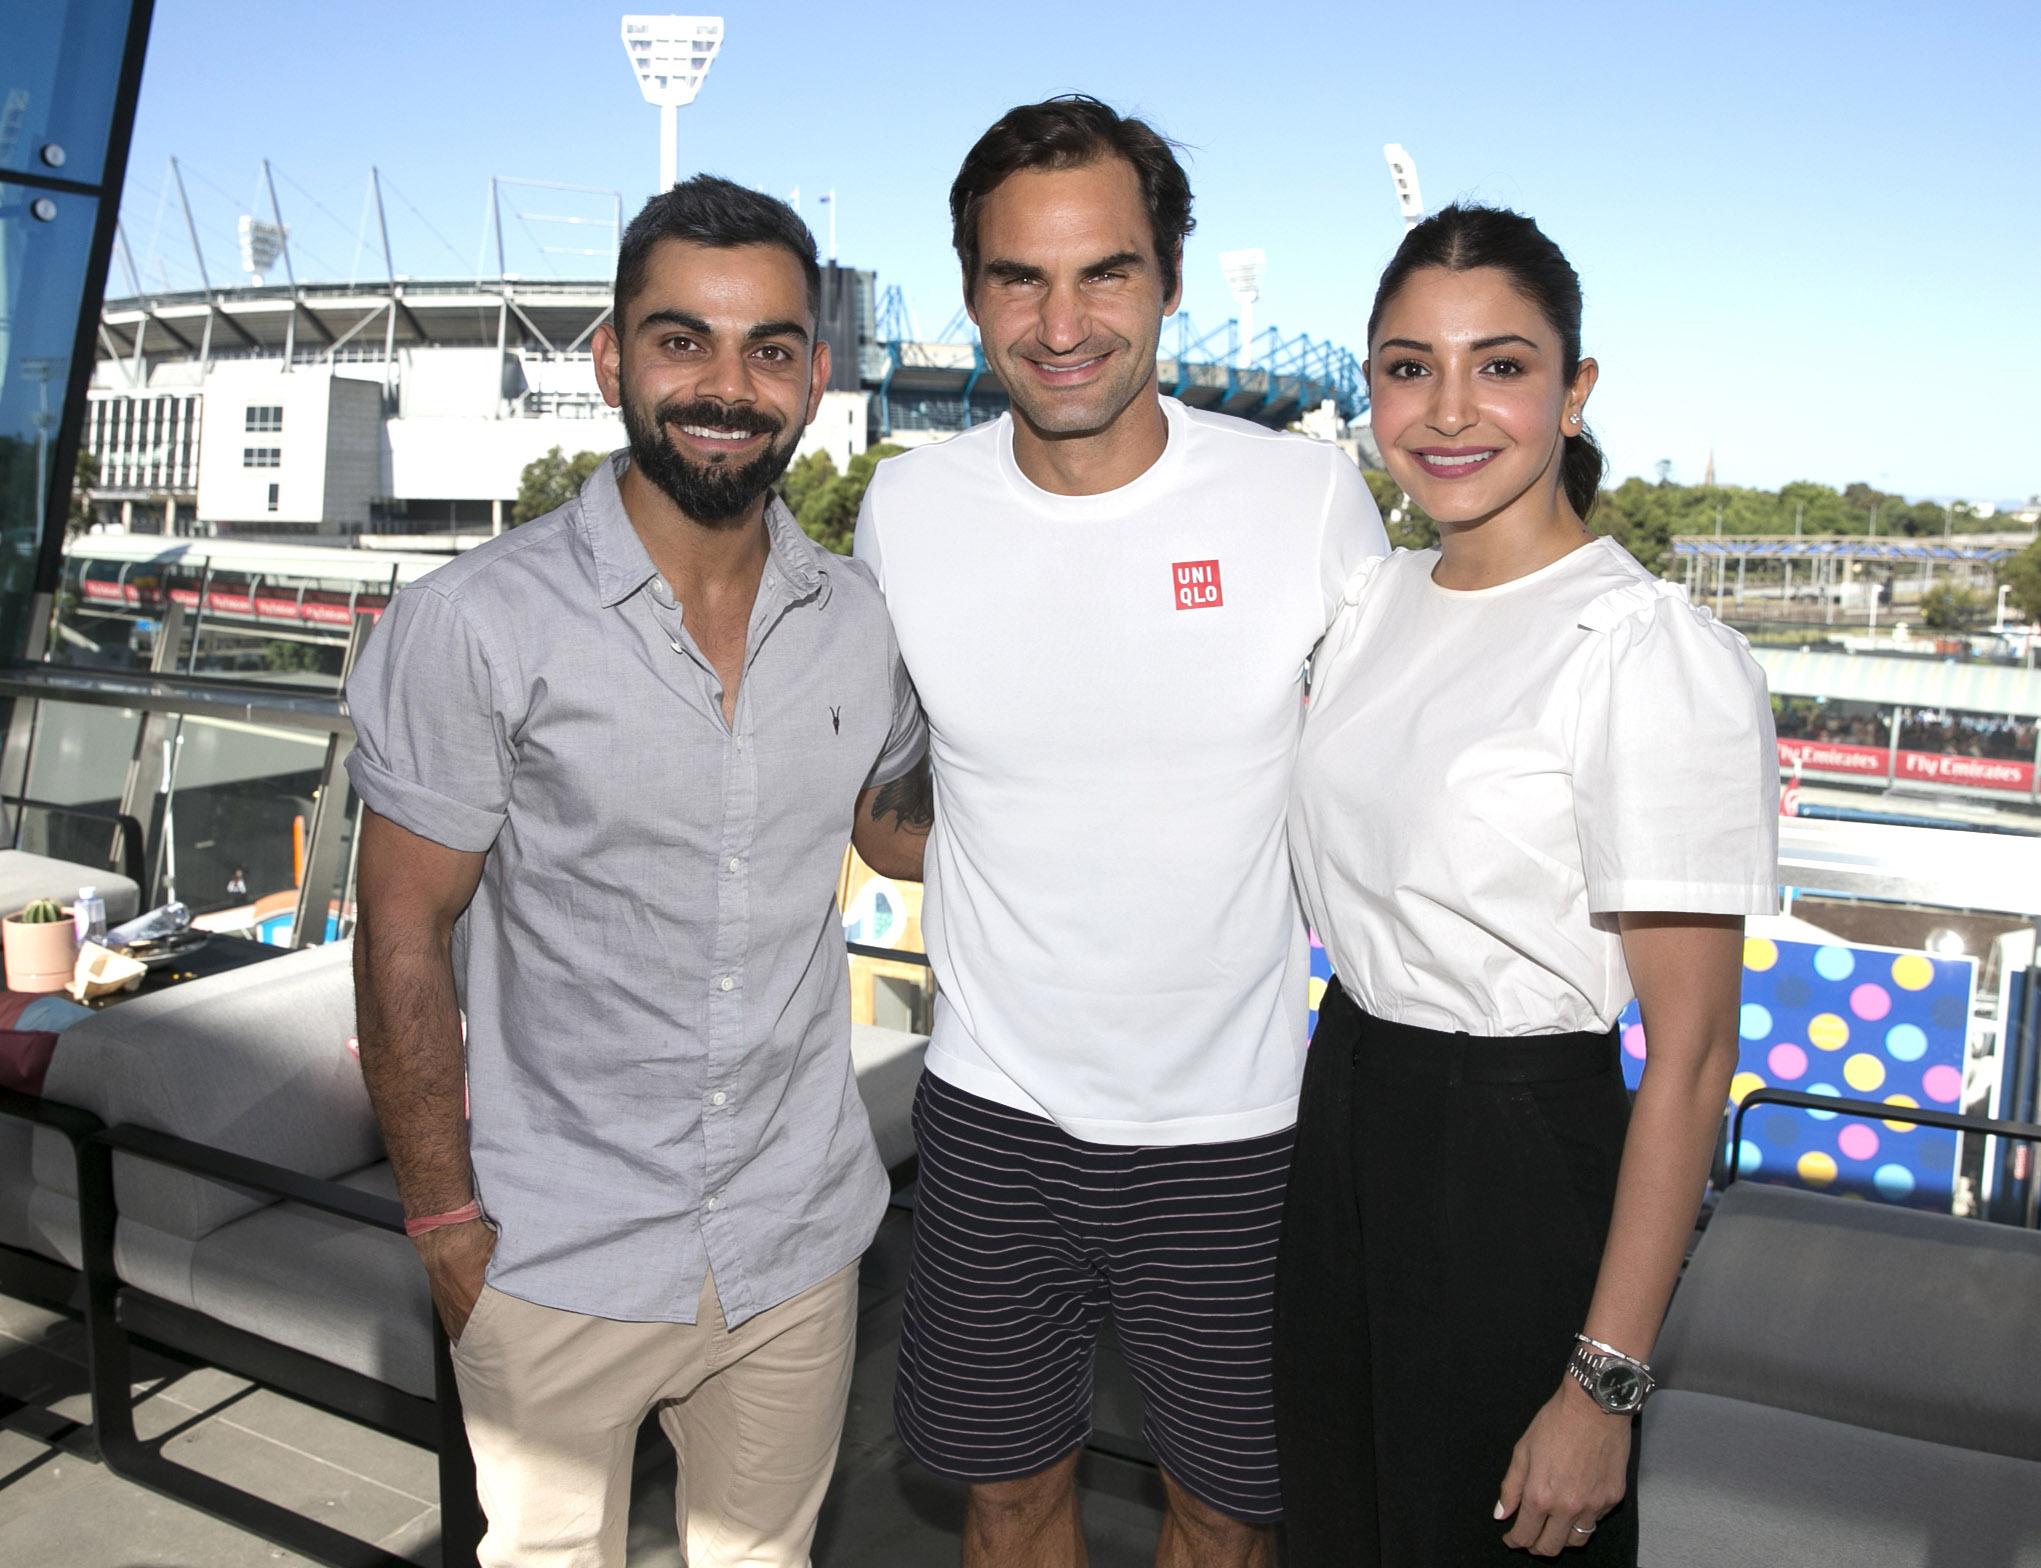 Virat Kohli attends Australian Open, posts  picture with Roger Federer